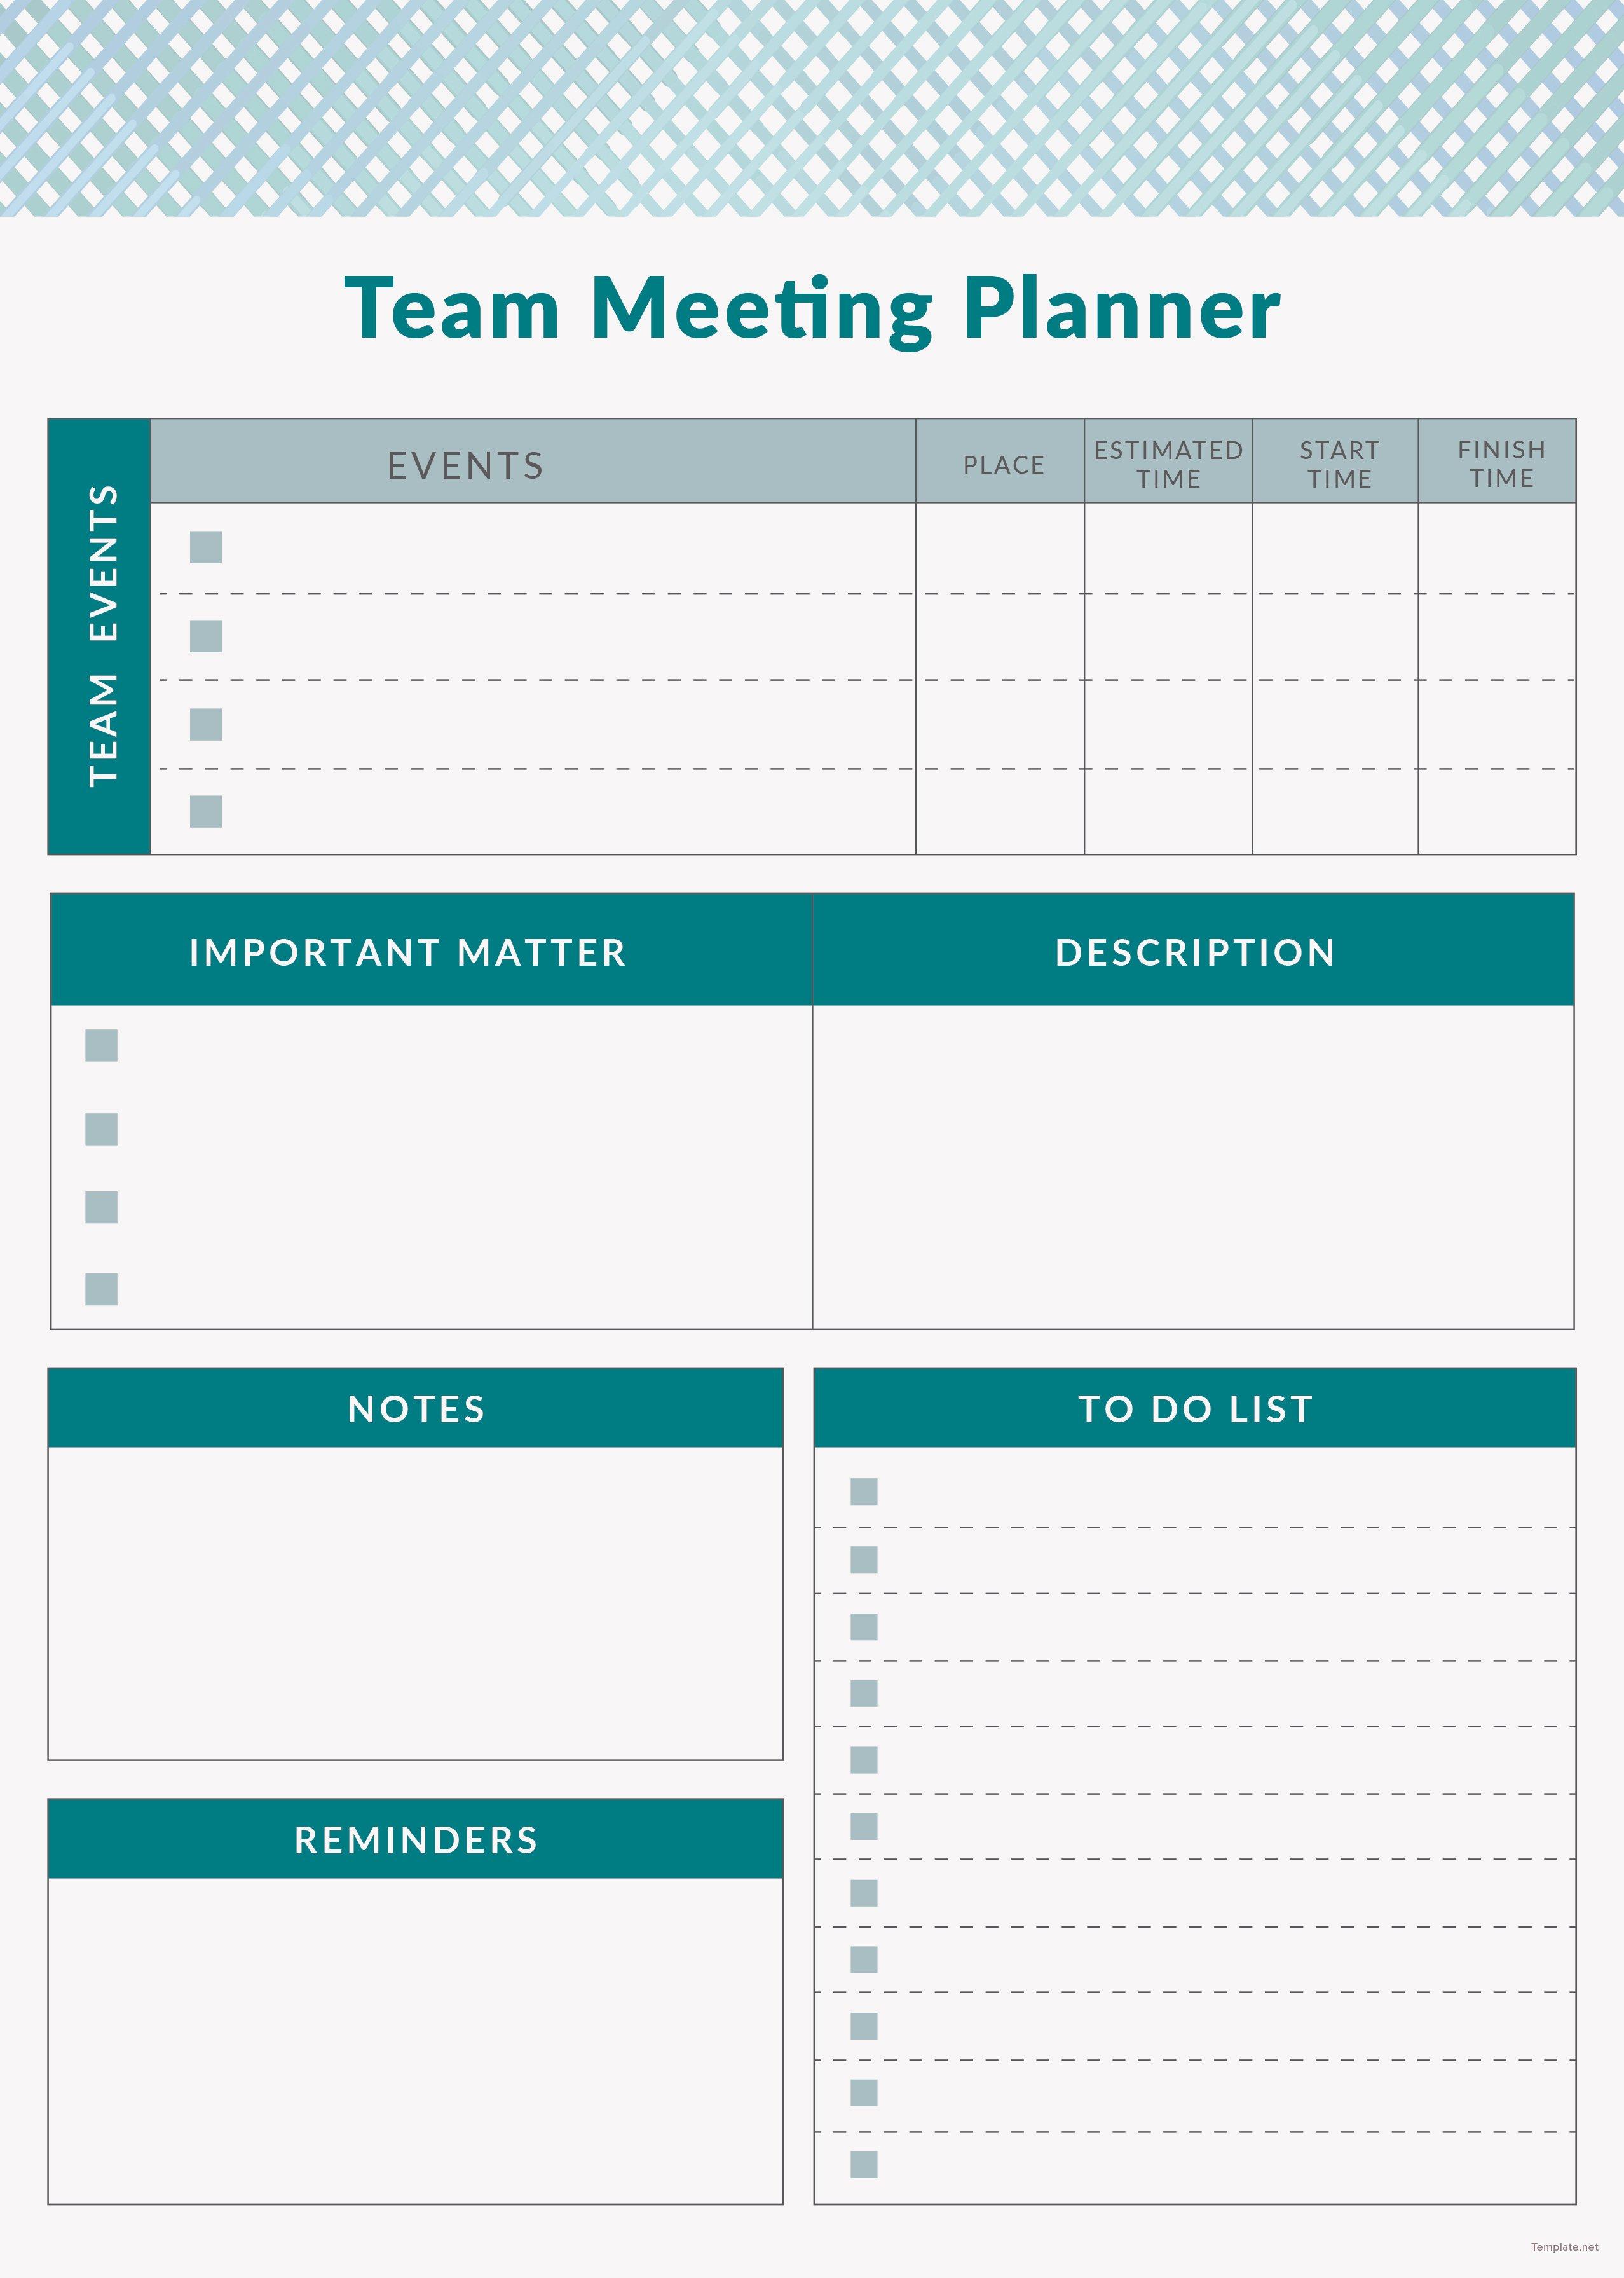 free team meeting planner template in adobe illustrator